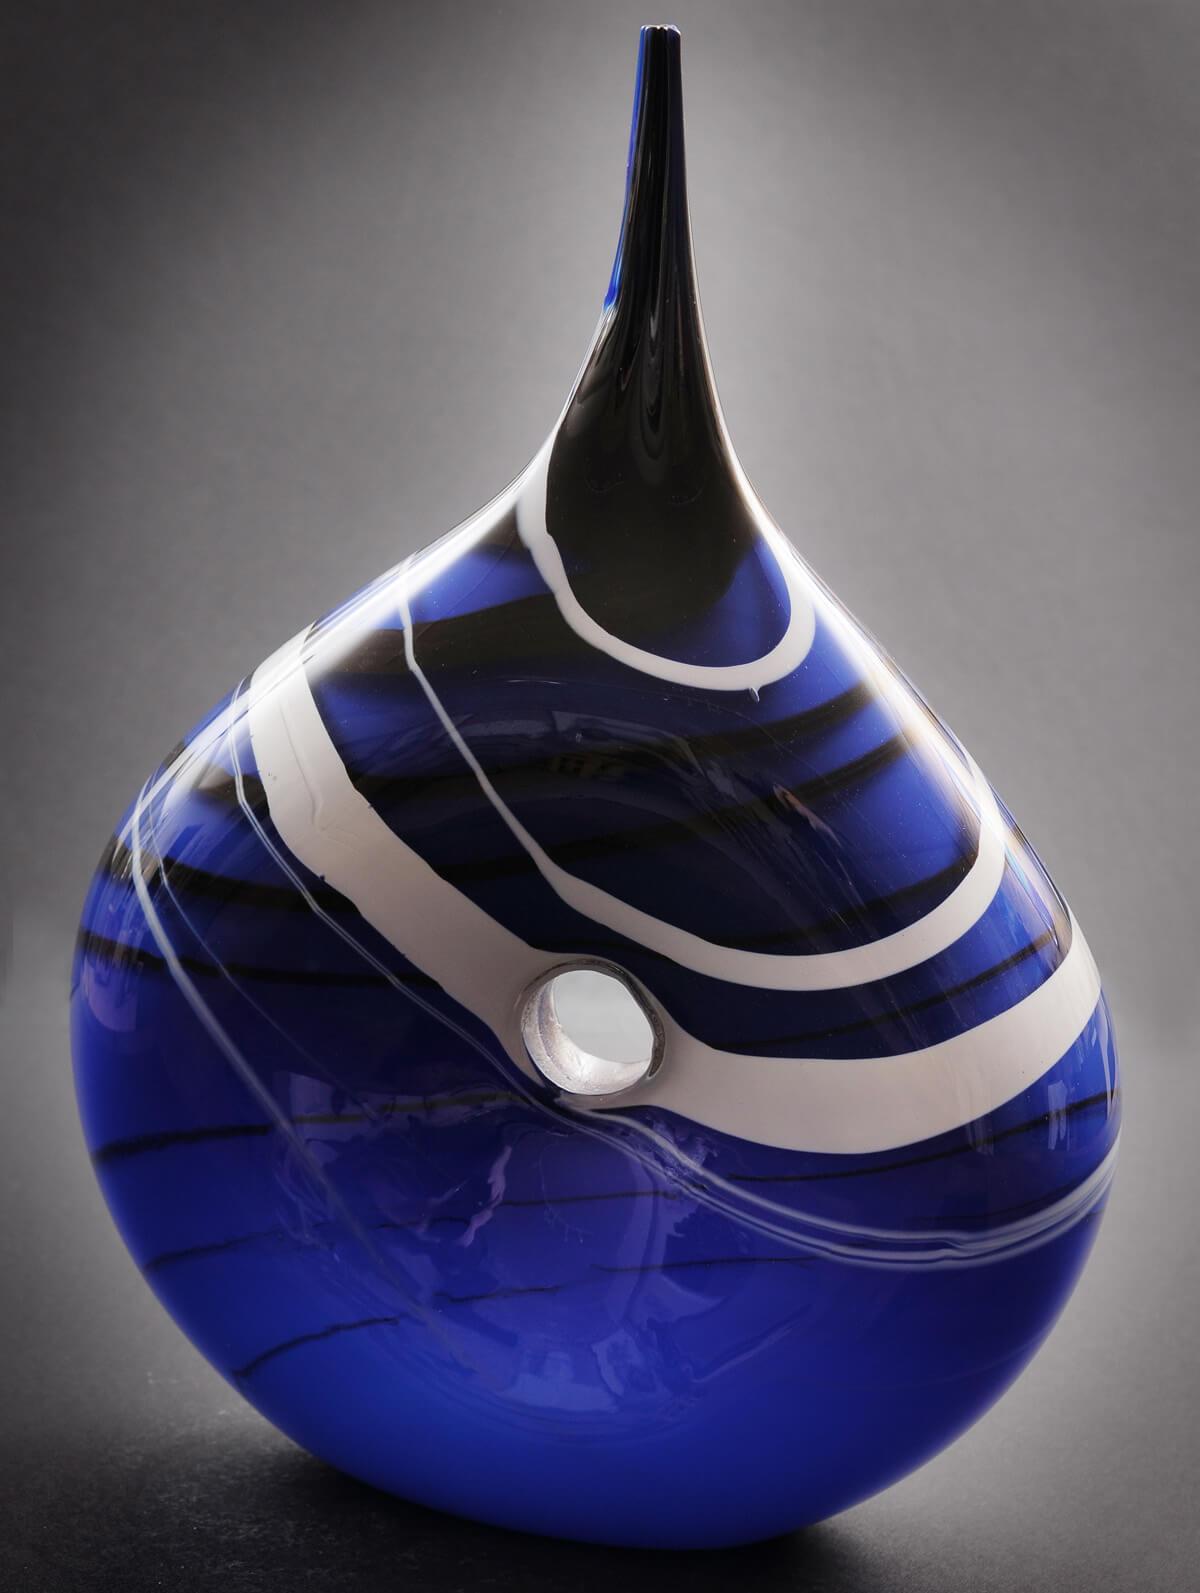 Blueberry (A Dougnut's Fantasy)